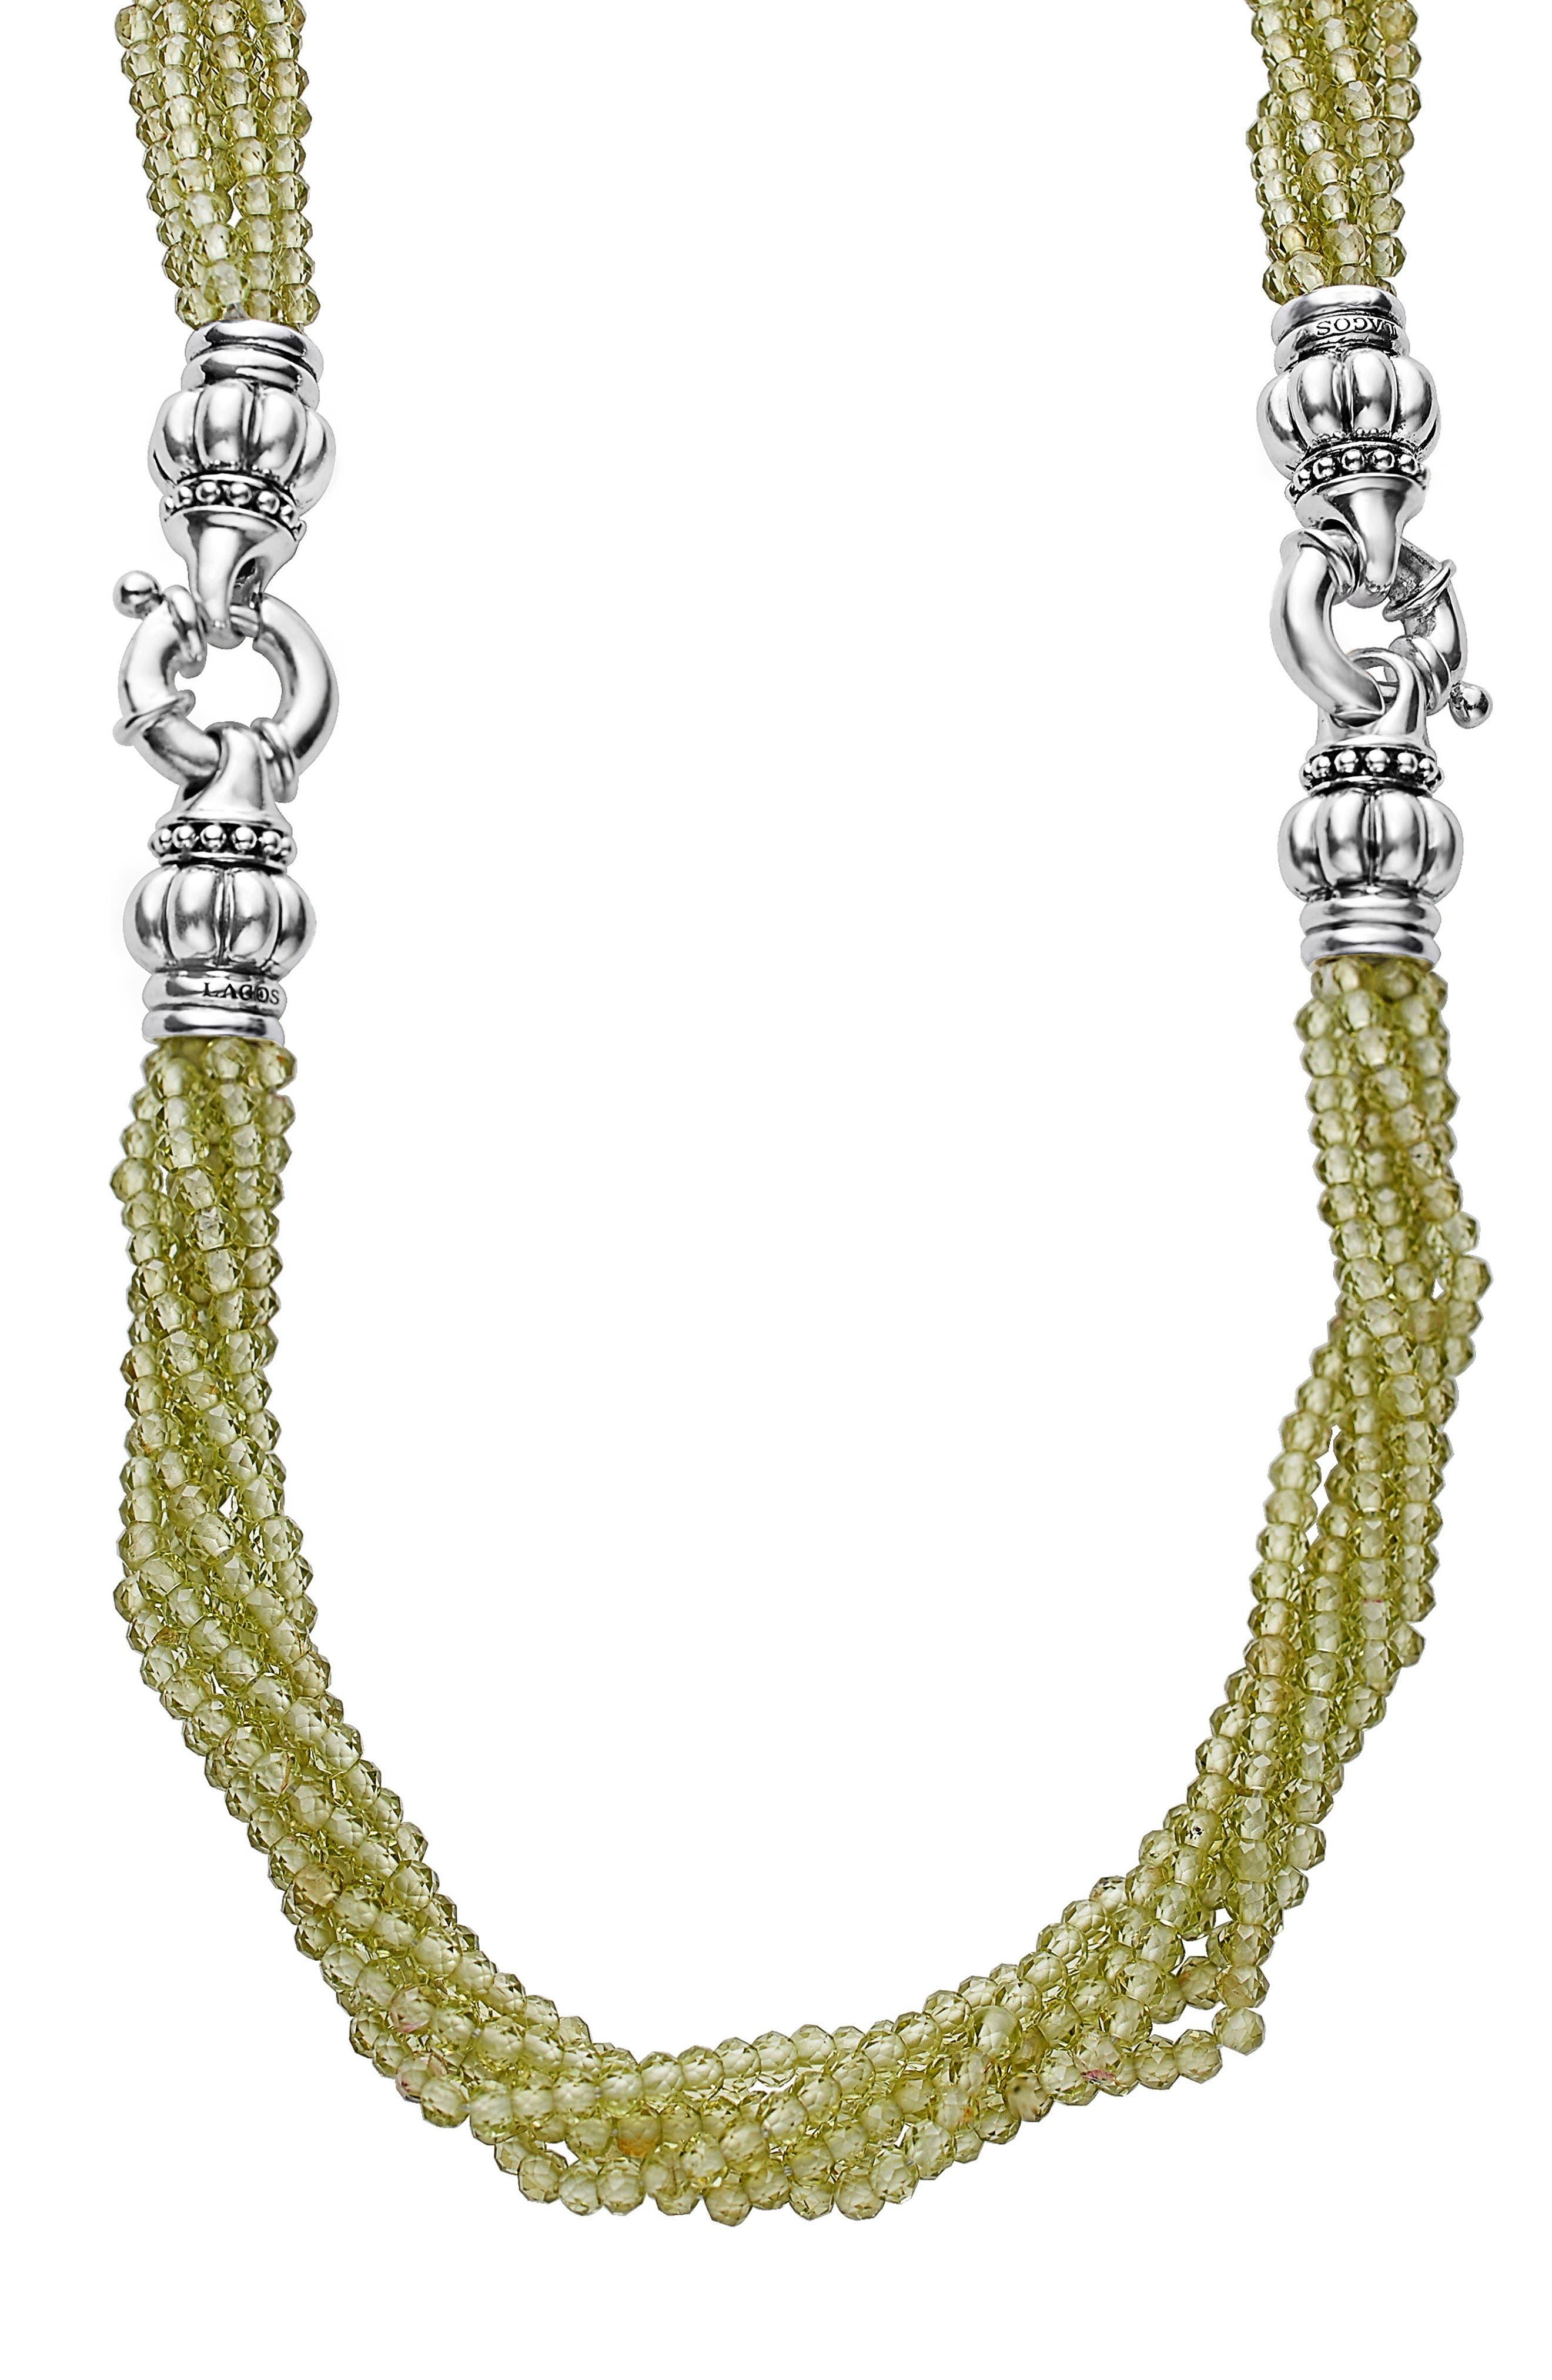 Main Image - LAGOS Caviar Icon Bead Convertible Bracelet & Necklace